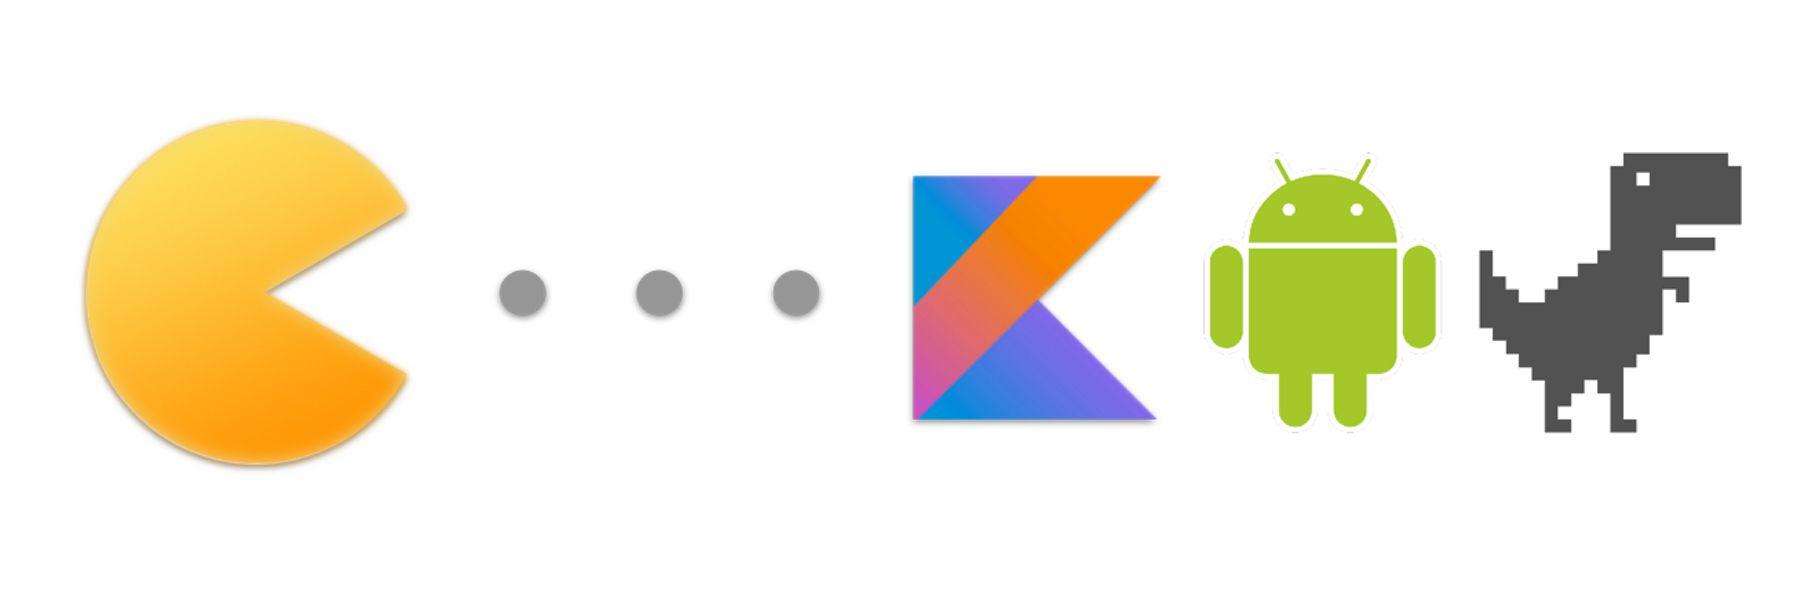 koin-2.0